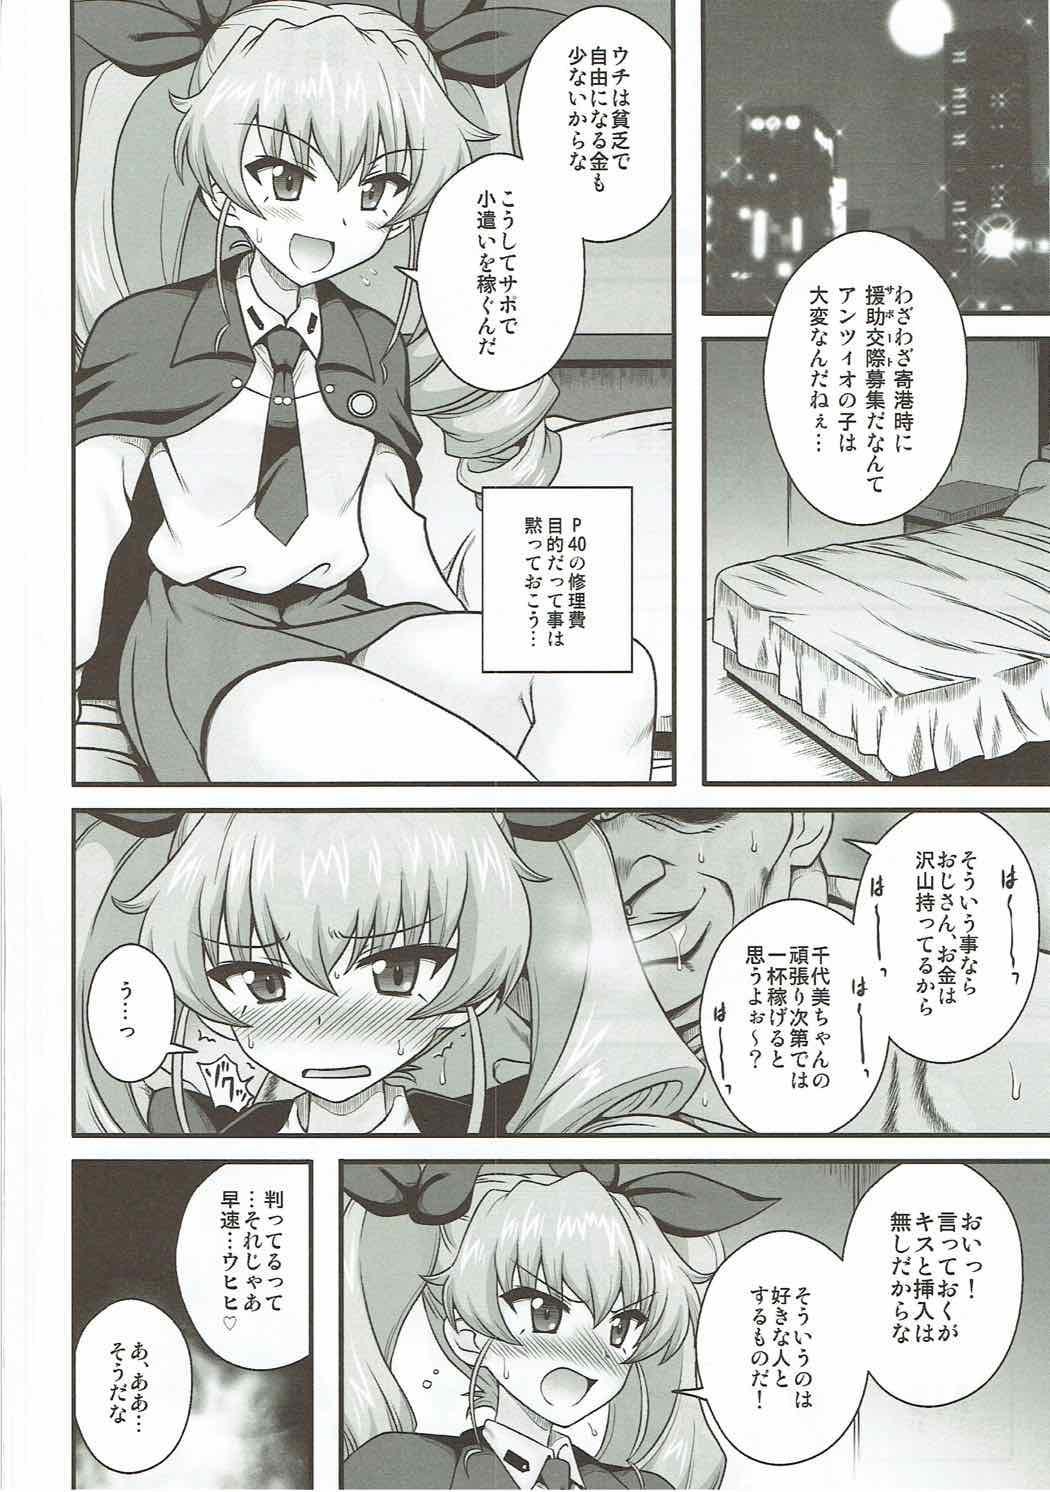 Anzio Enkou Chiyomi 17-sai 2